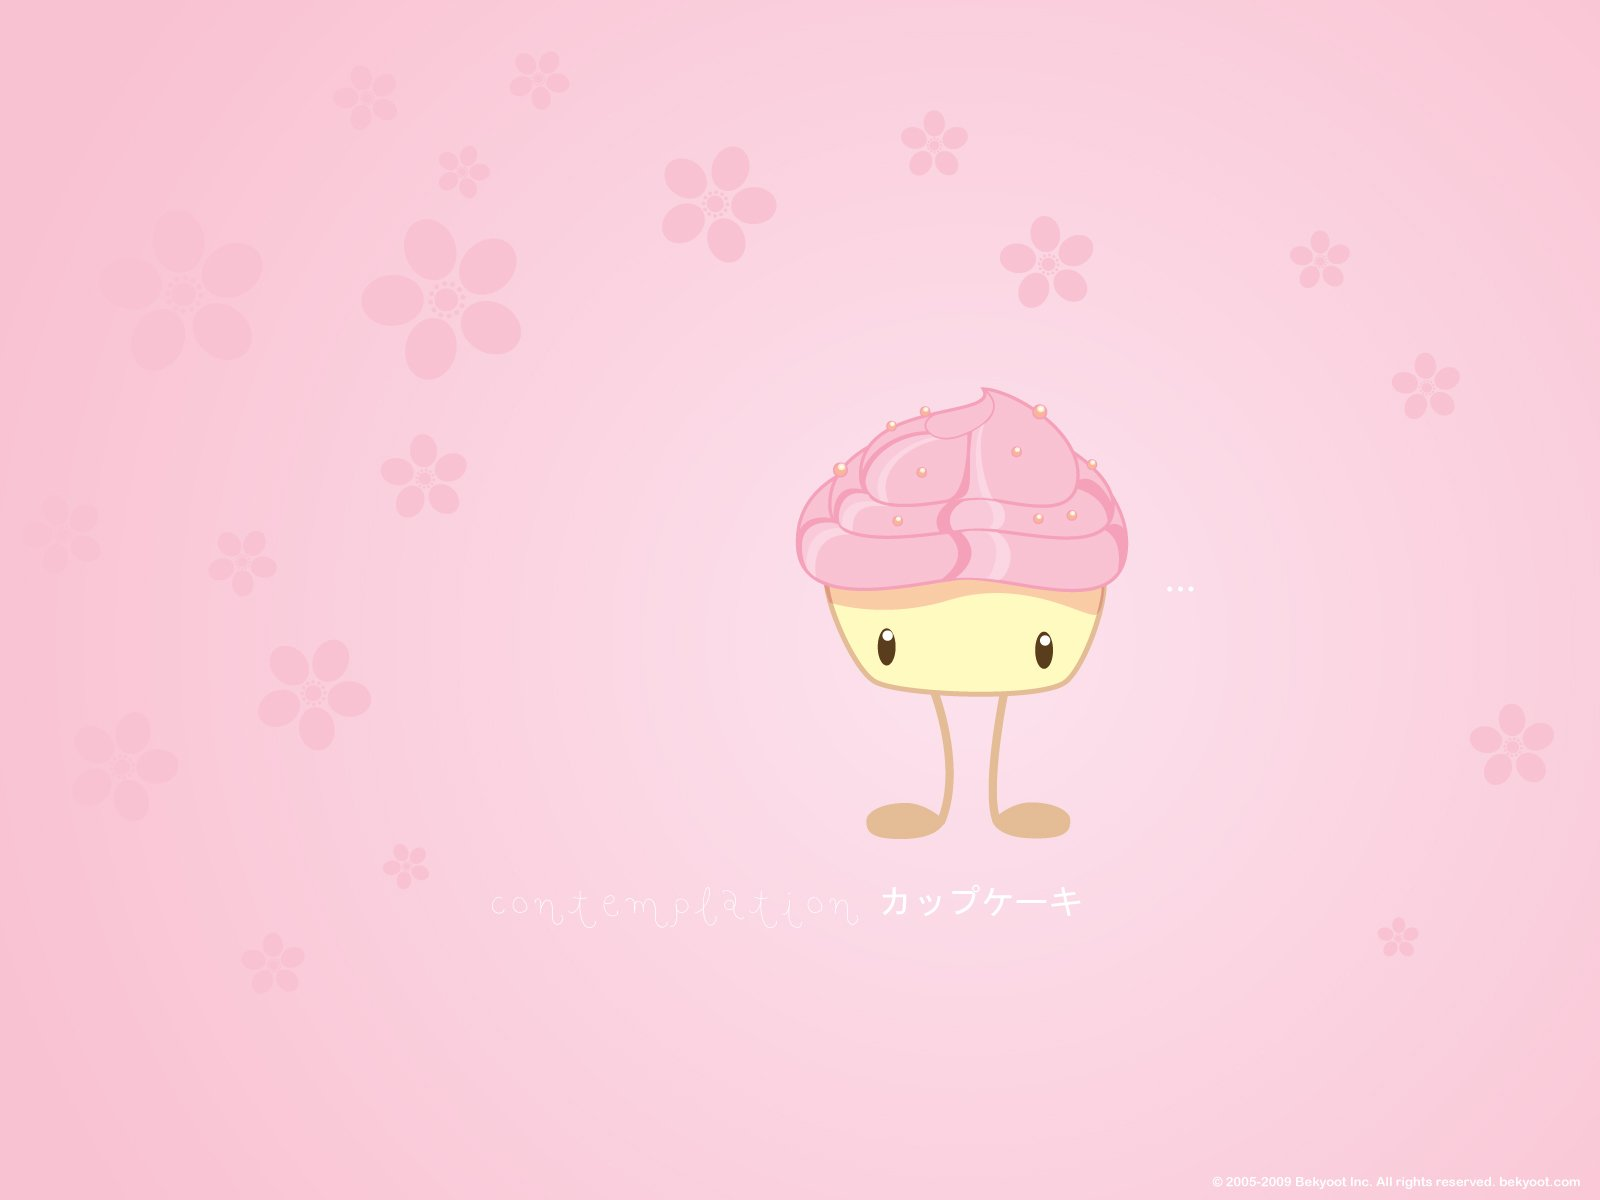 Fantastic Wallpaper Hello Kitty Plain - 3KBsnX  Snapshot_885969.jpg